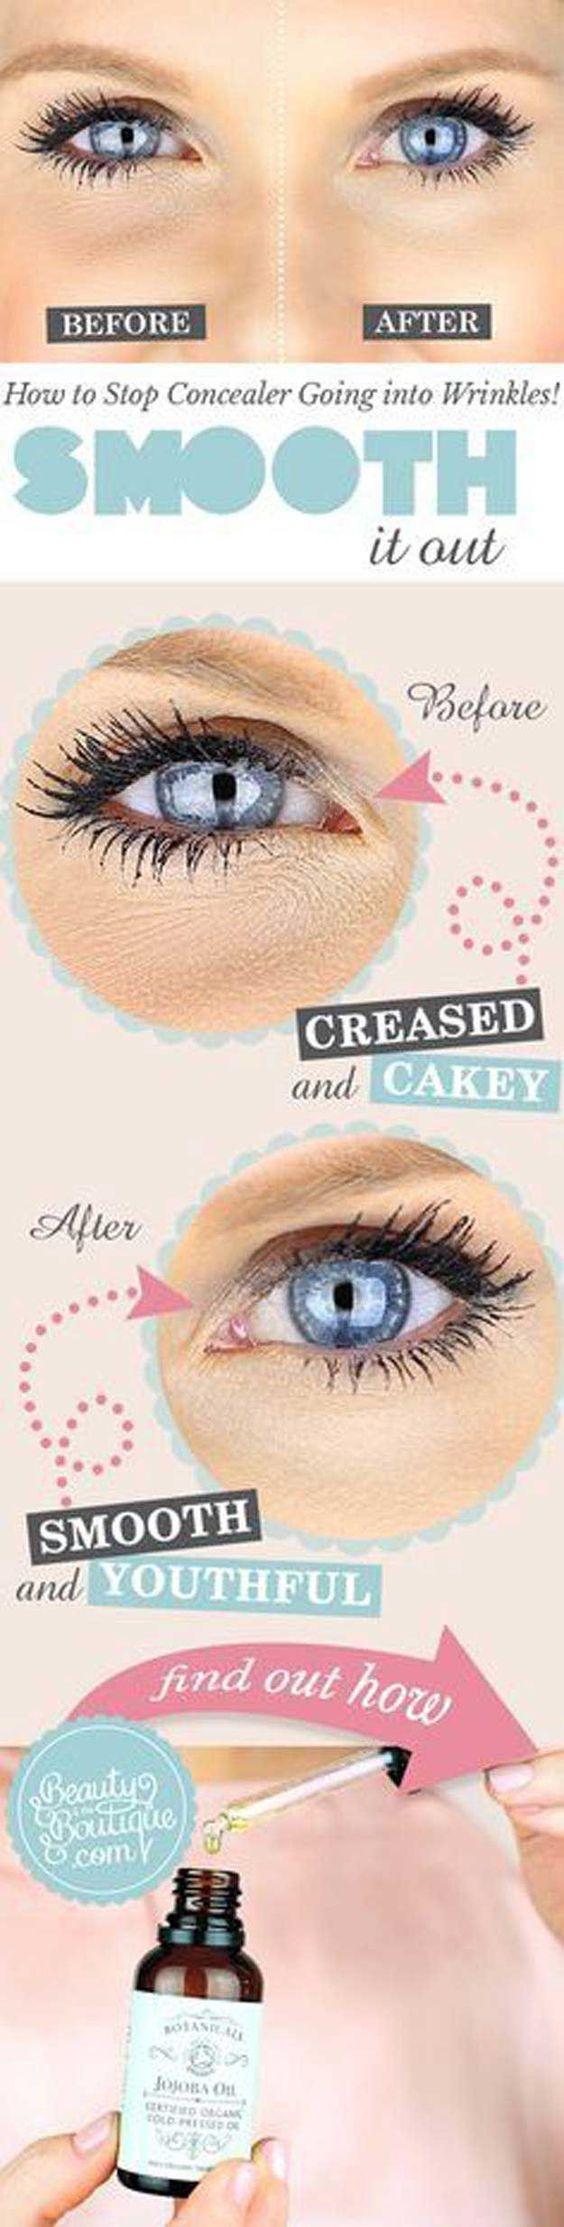 32 Makeup Tips That Make Wrinkles Vanish Beauty over 40